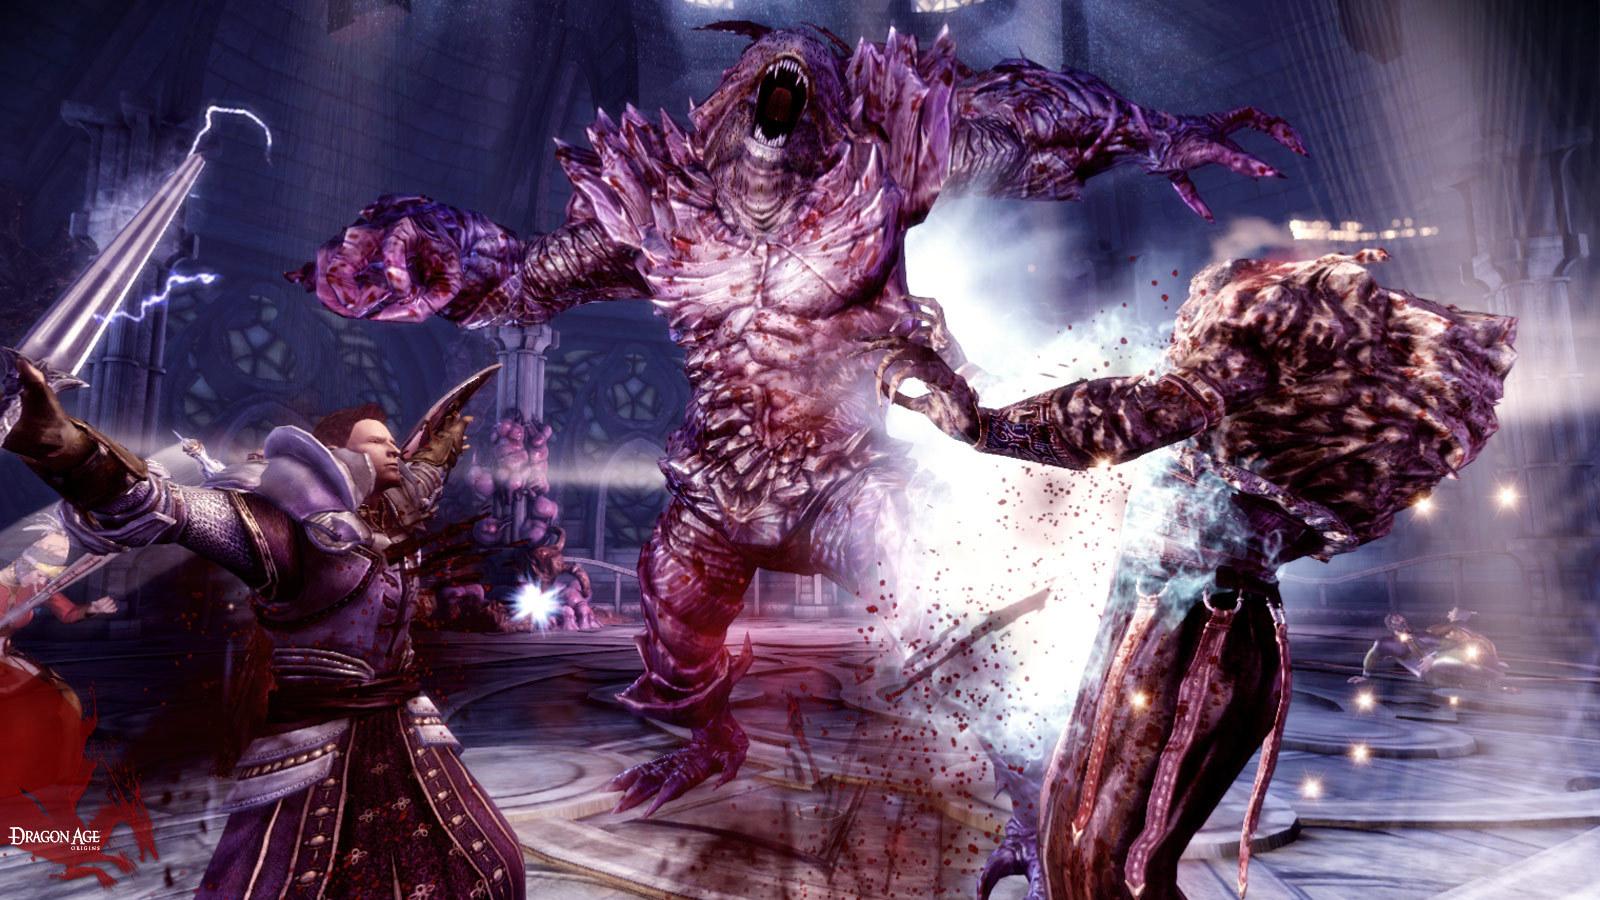 Dragon Age: Origins Screenshot 2